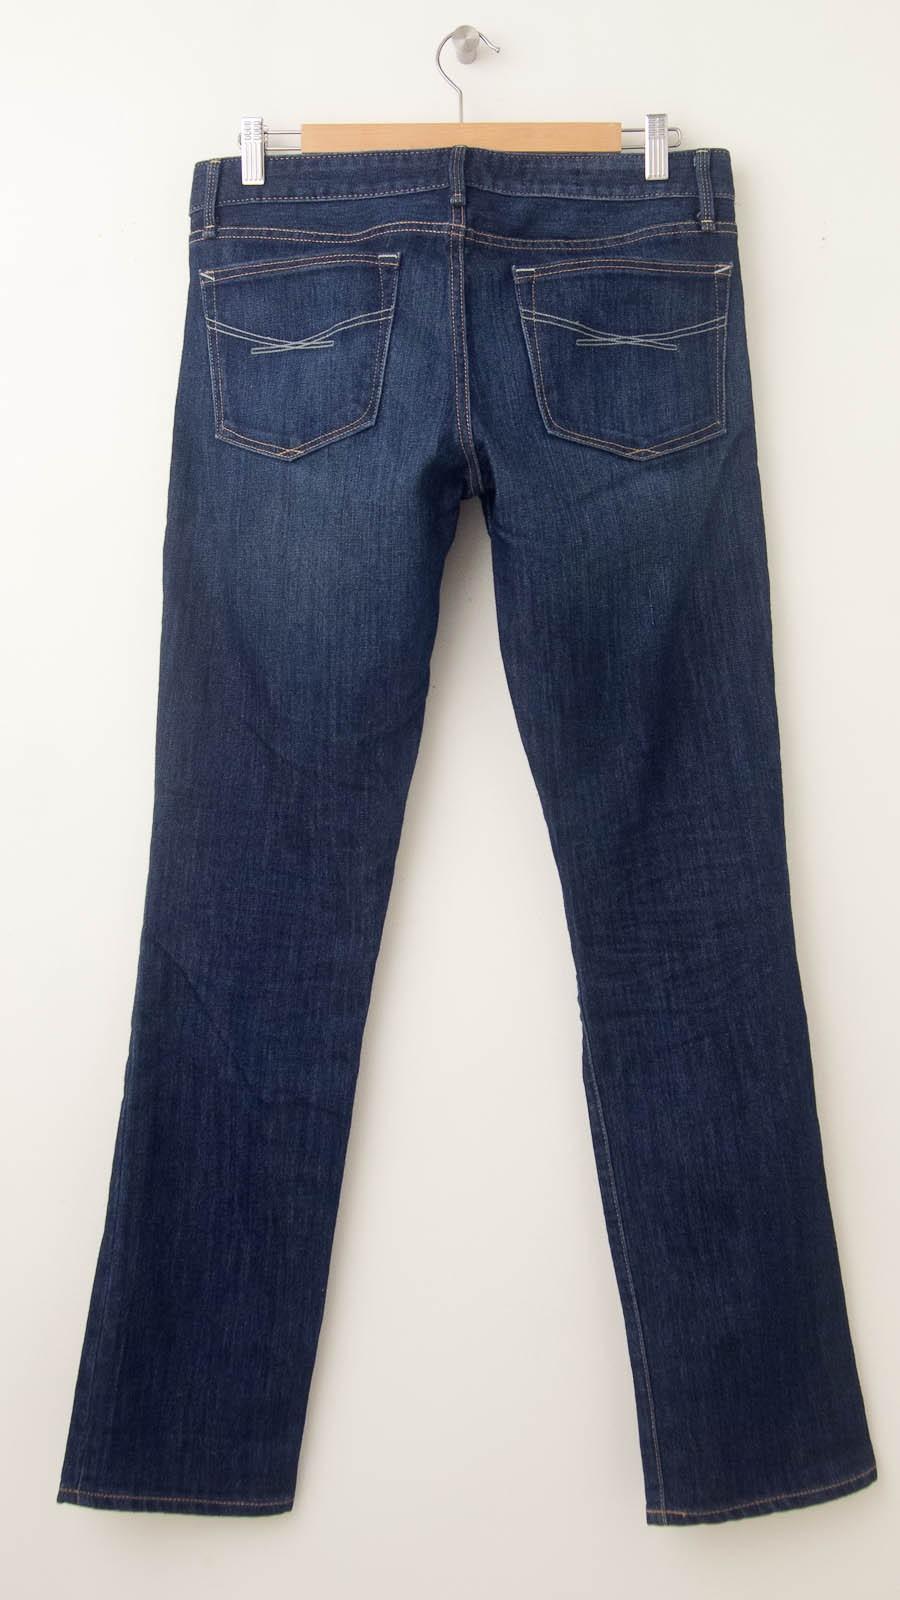 Gap 1969 Real Straight Jeans Women S 28 6r Regular